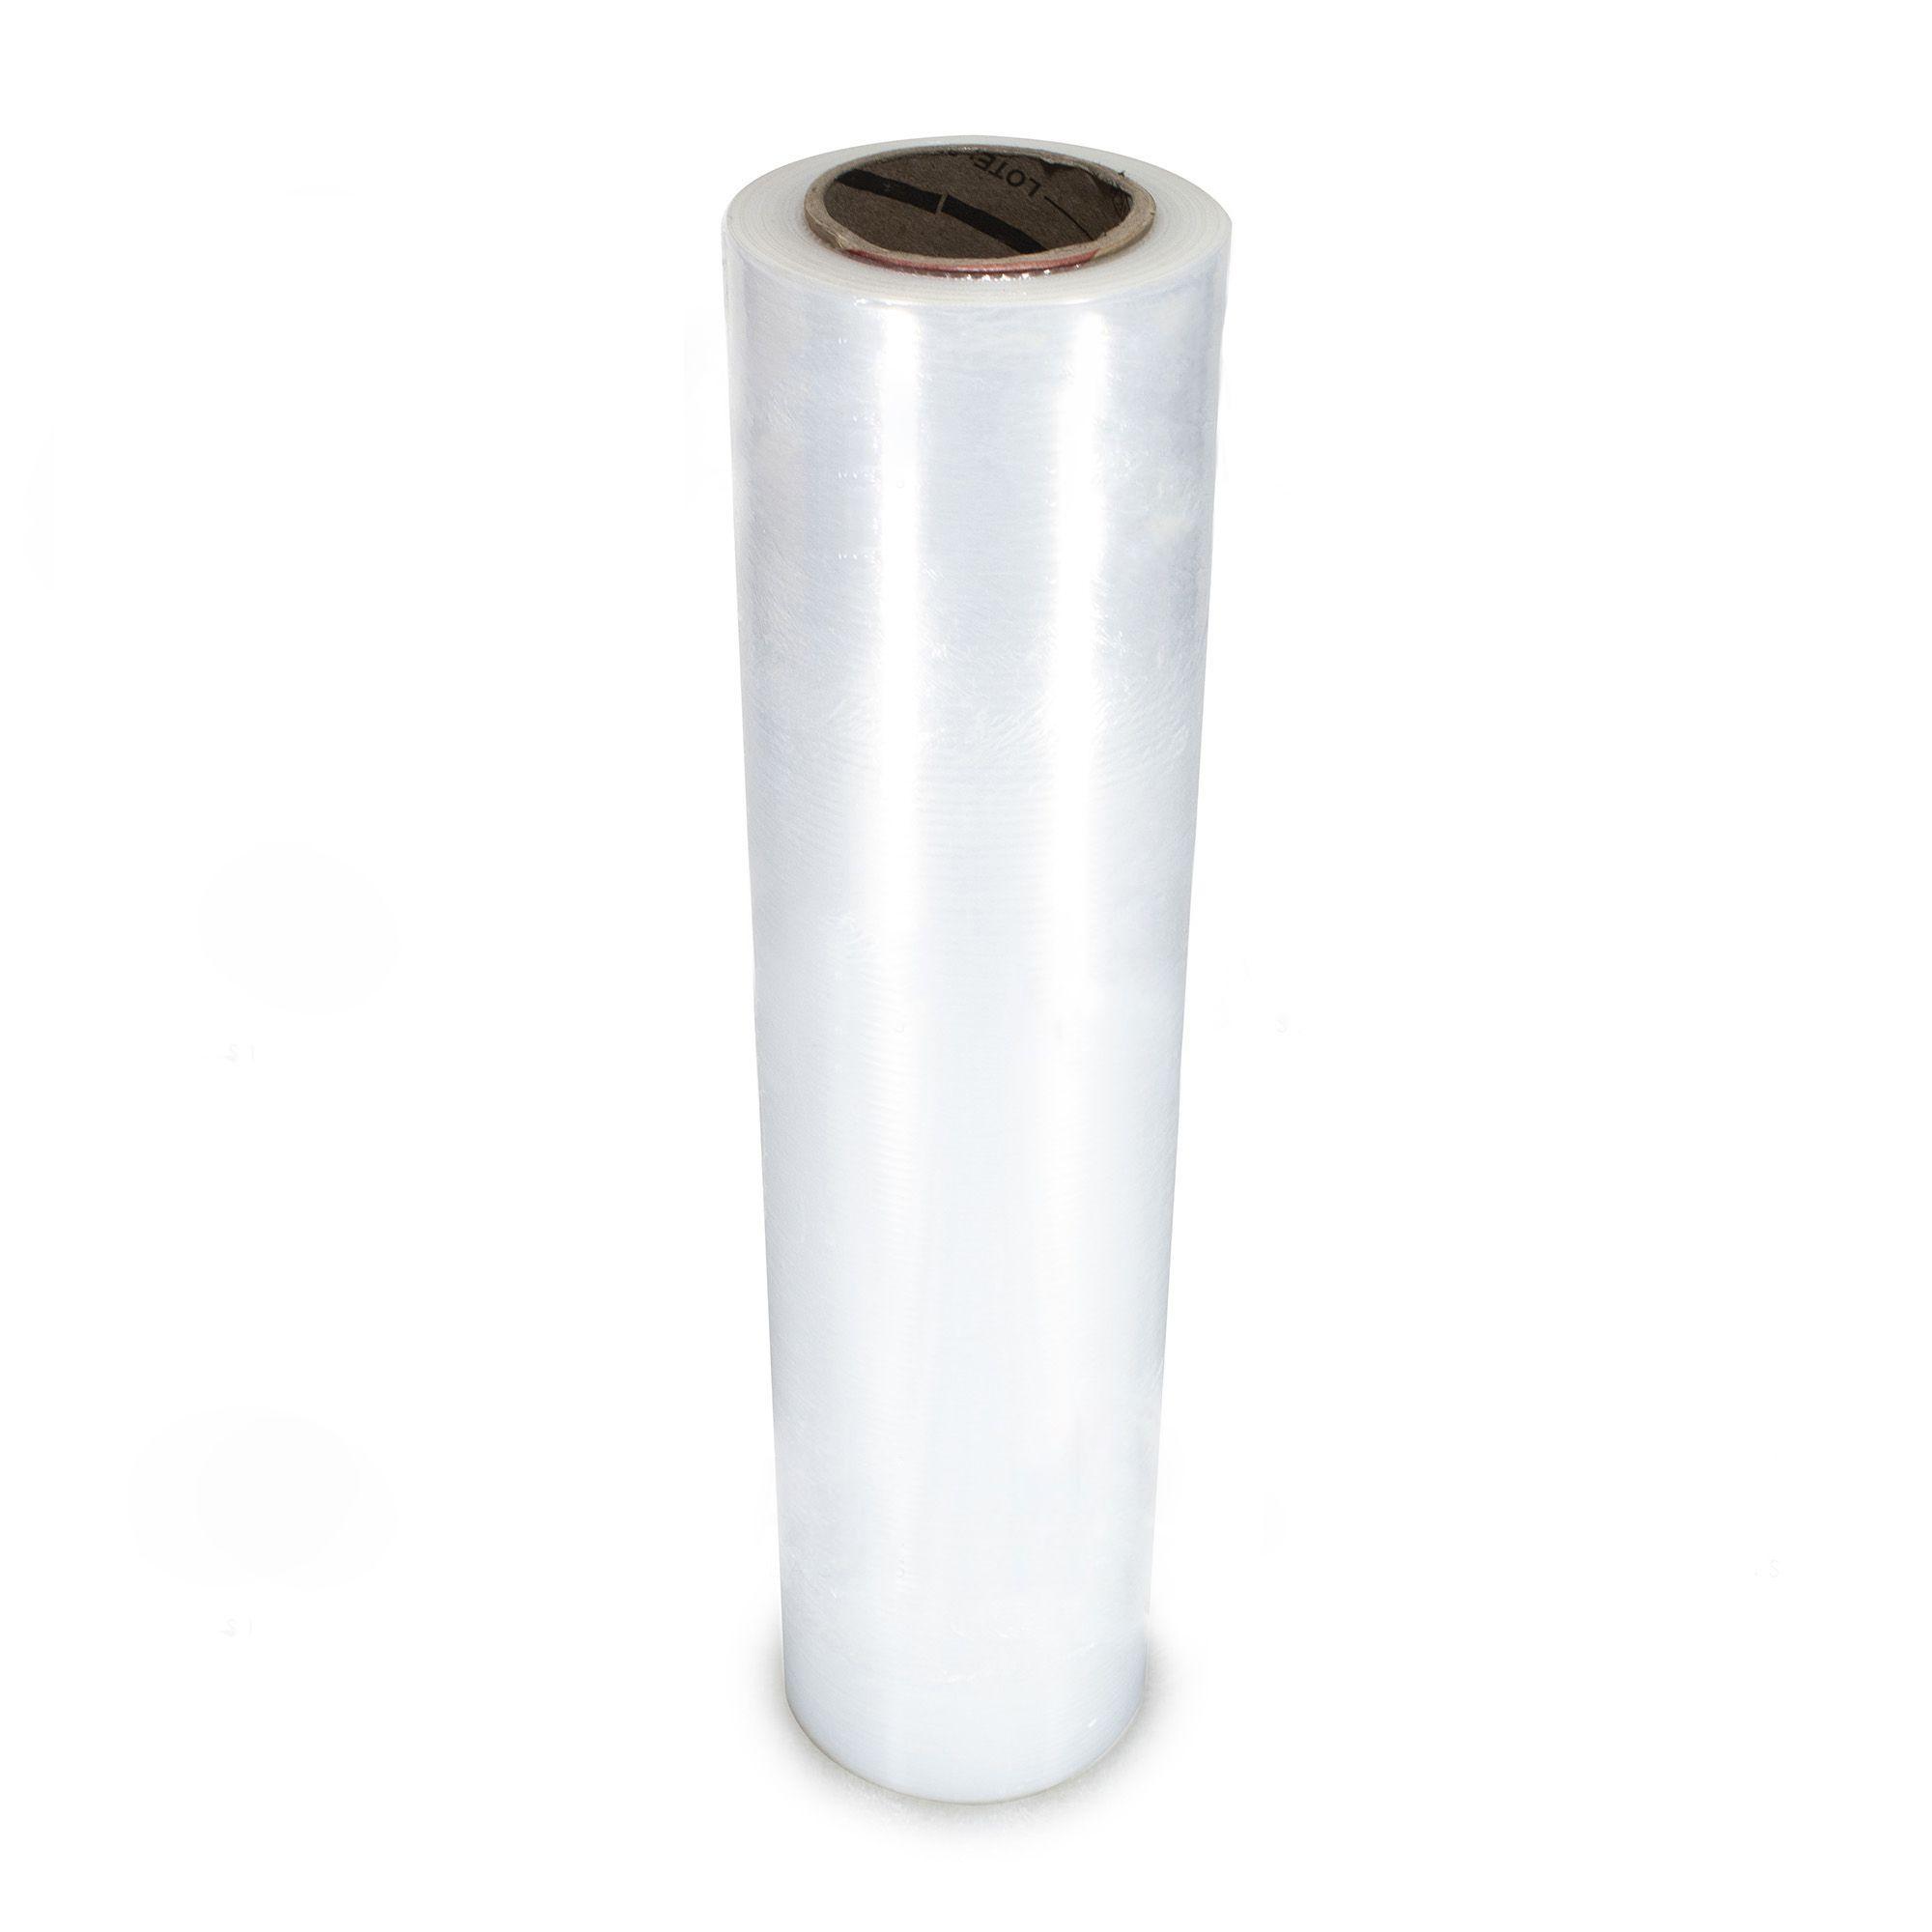 Filme Stretch 50x30 micras c/ tubete